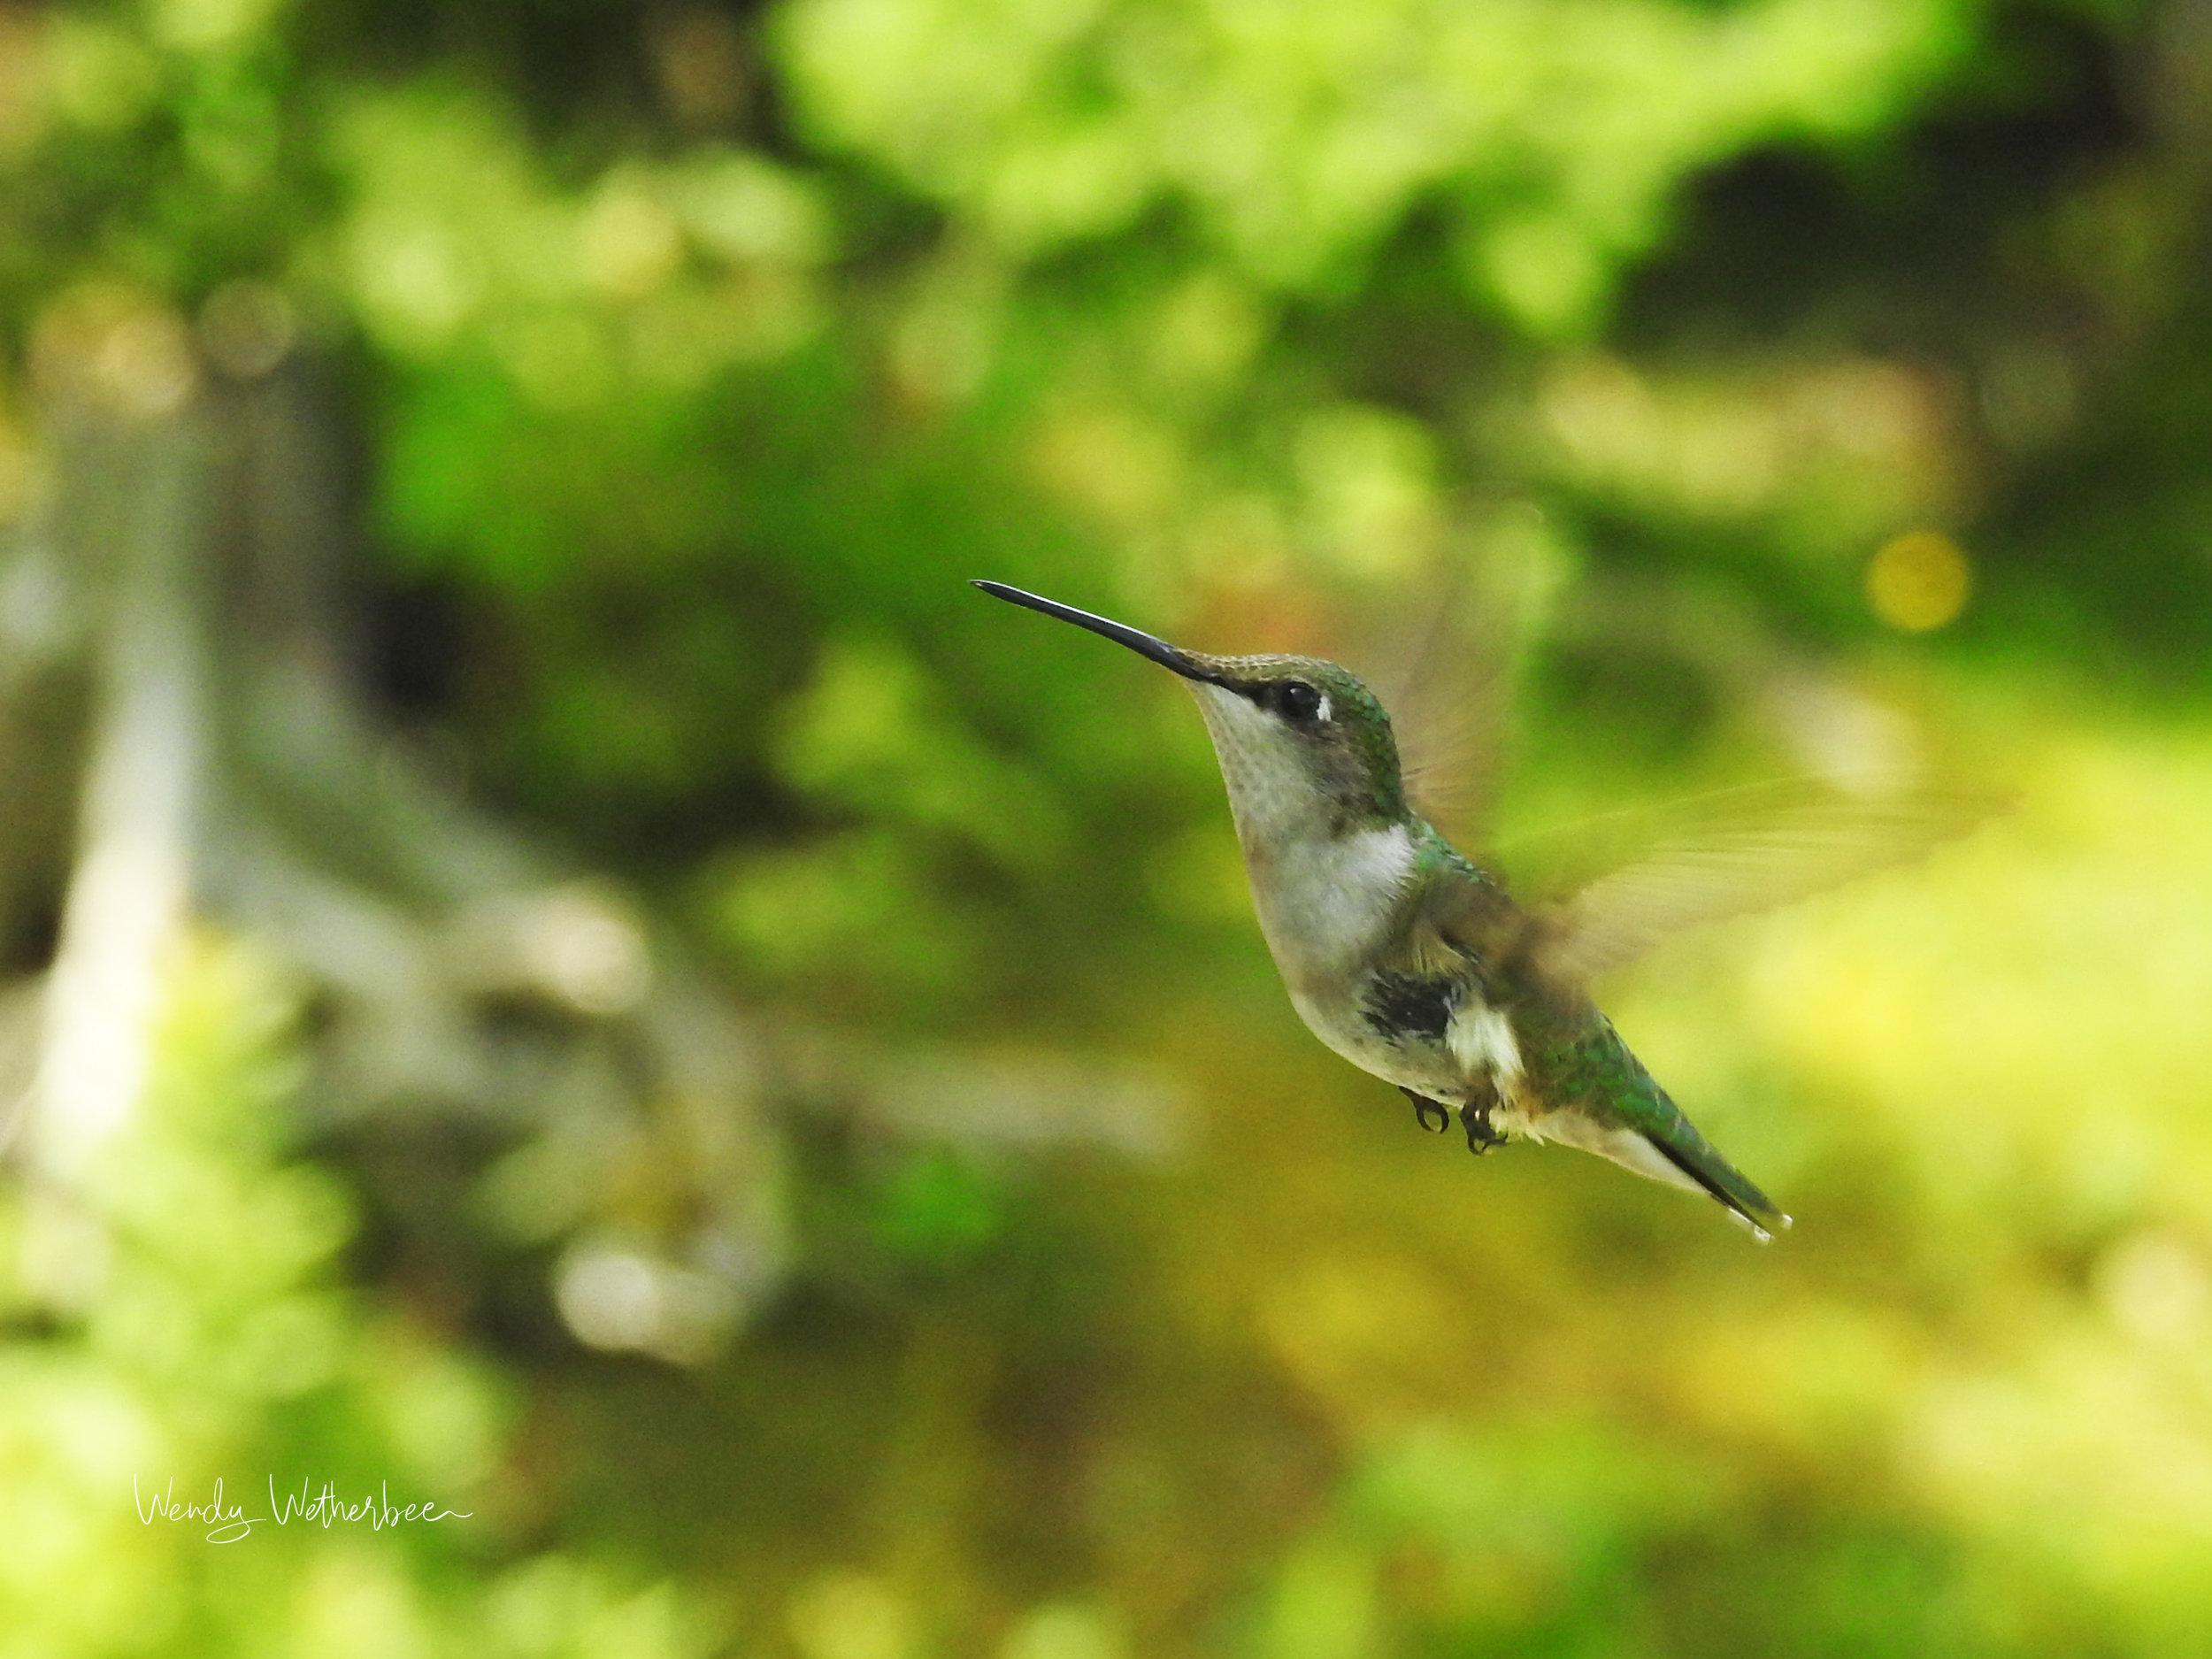 Xena - Warrior Princess - Ruby Throated Hummingbird © Wendy Wetherbee